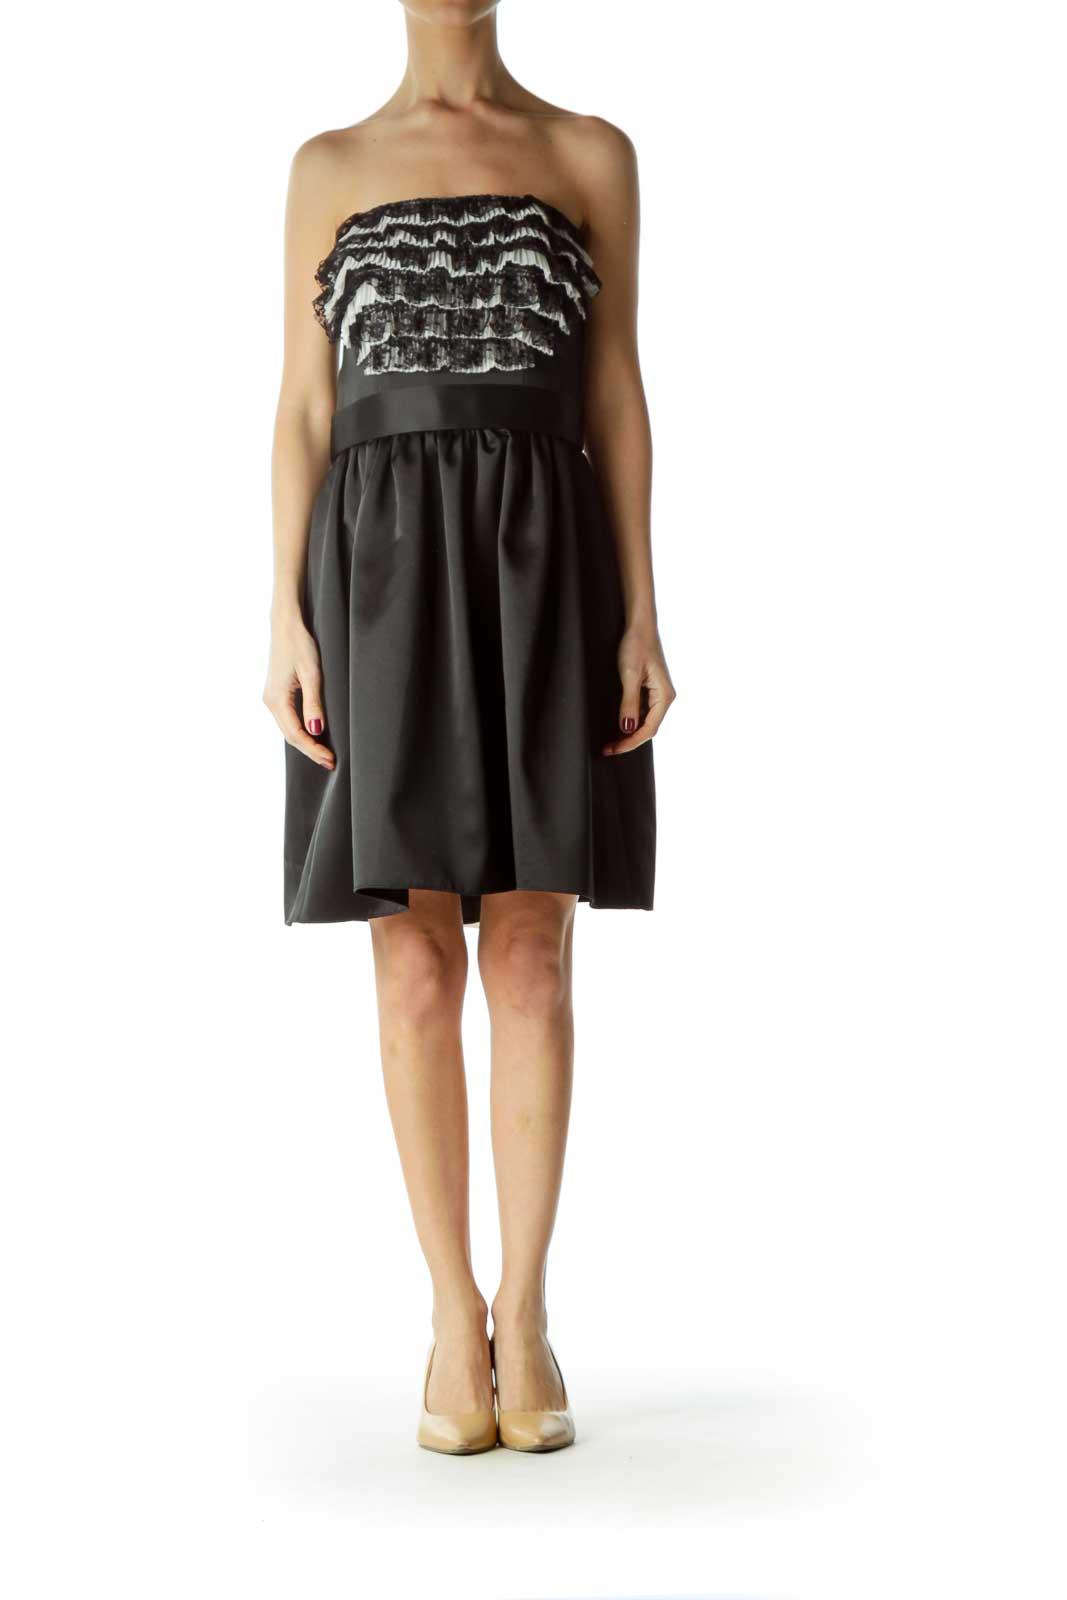 Black Chest Ruffled Strapless Cocktail Dress